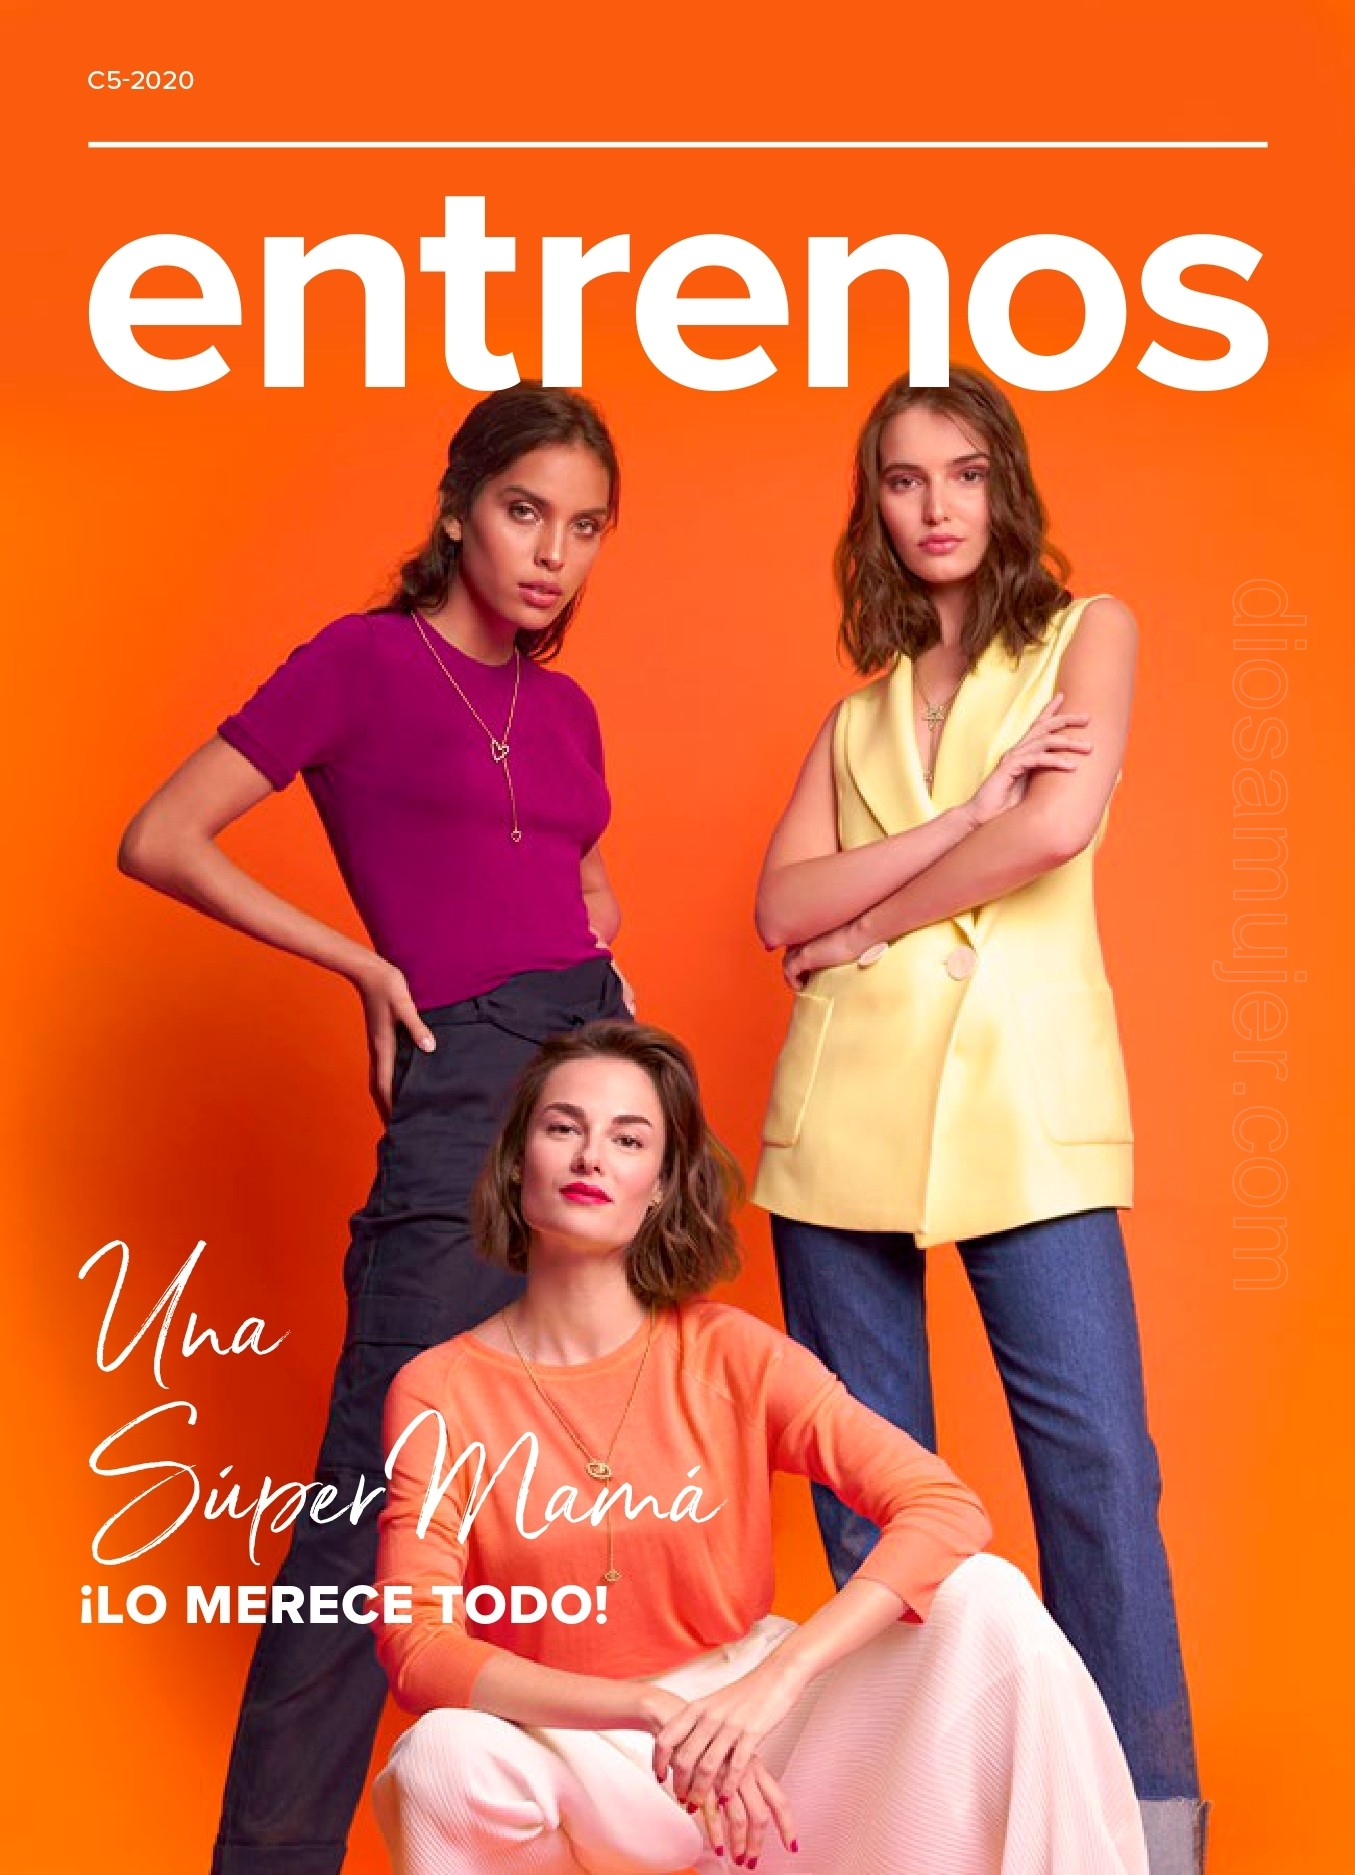 Entrenos Campana 05 Mexico 2020 Diosa Mujer